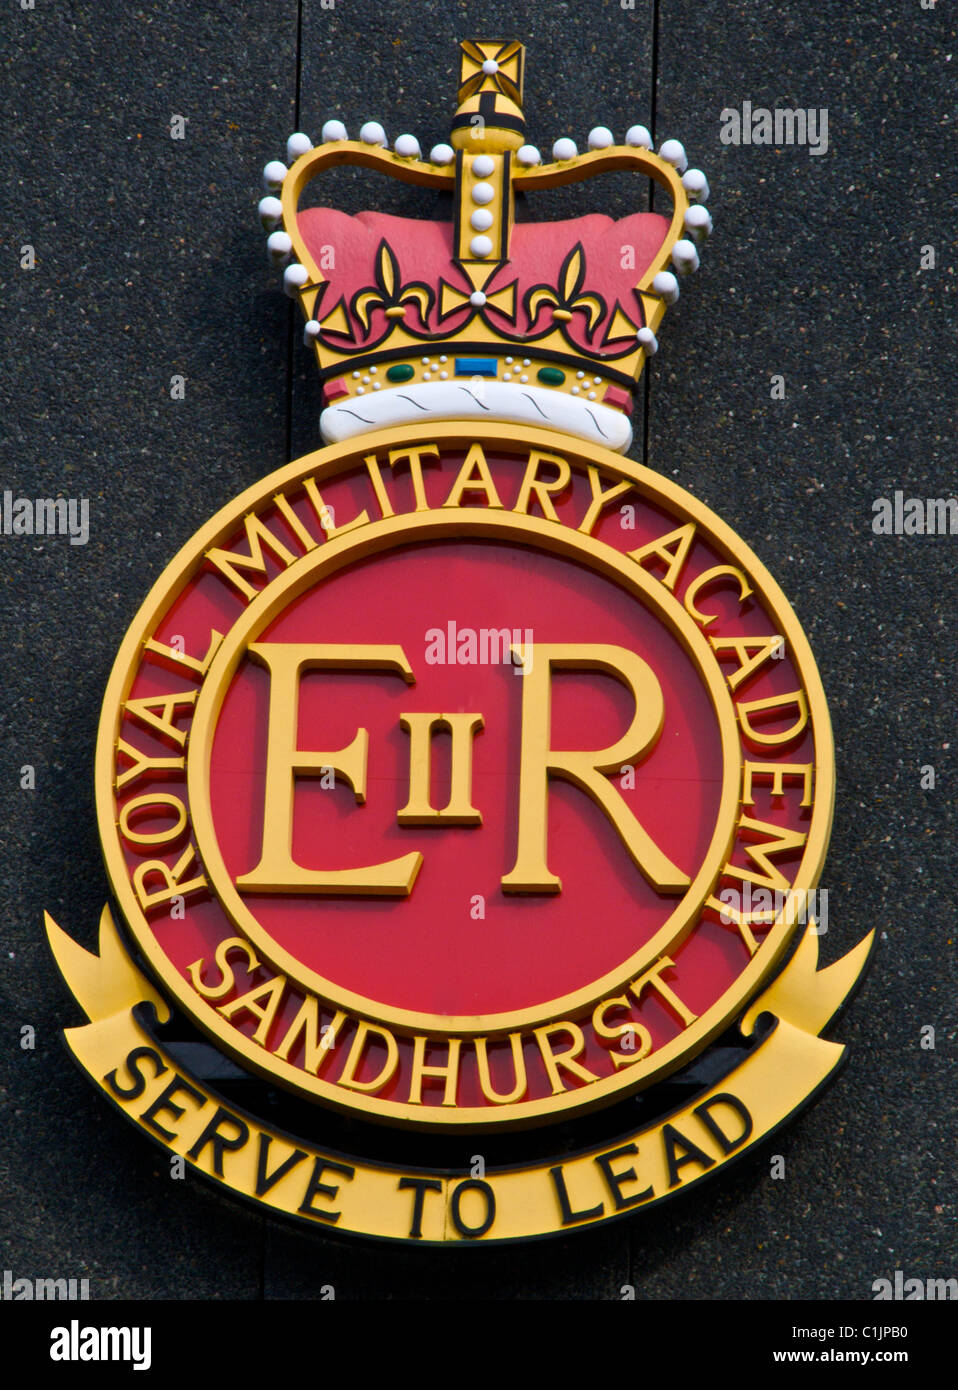 Badge, emblem of the Royal Military Academy Sandhurst - Stock Image